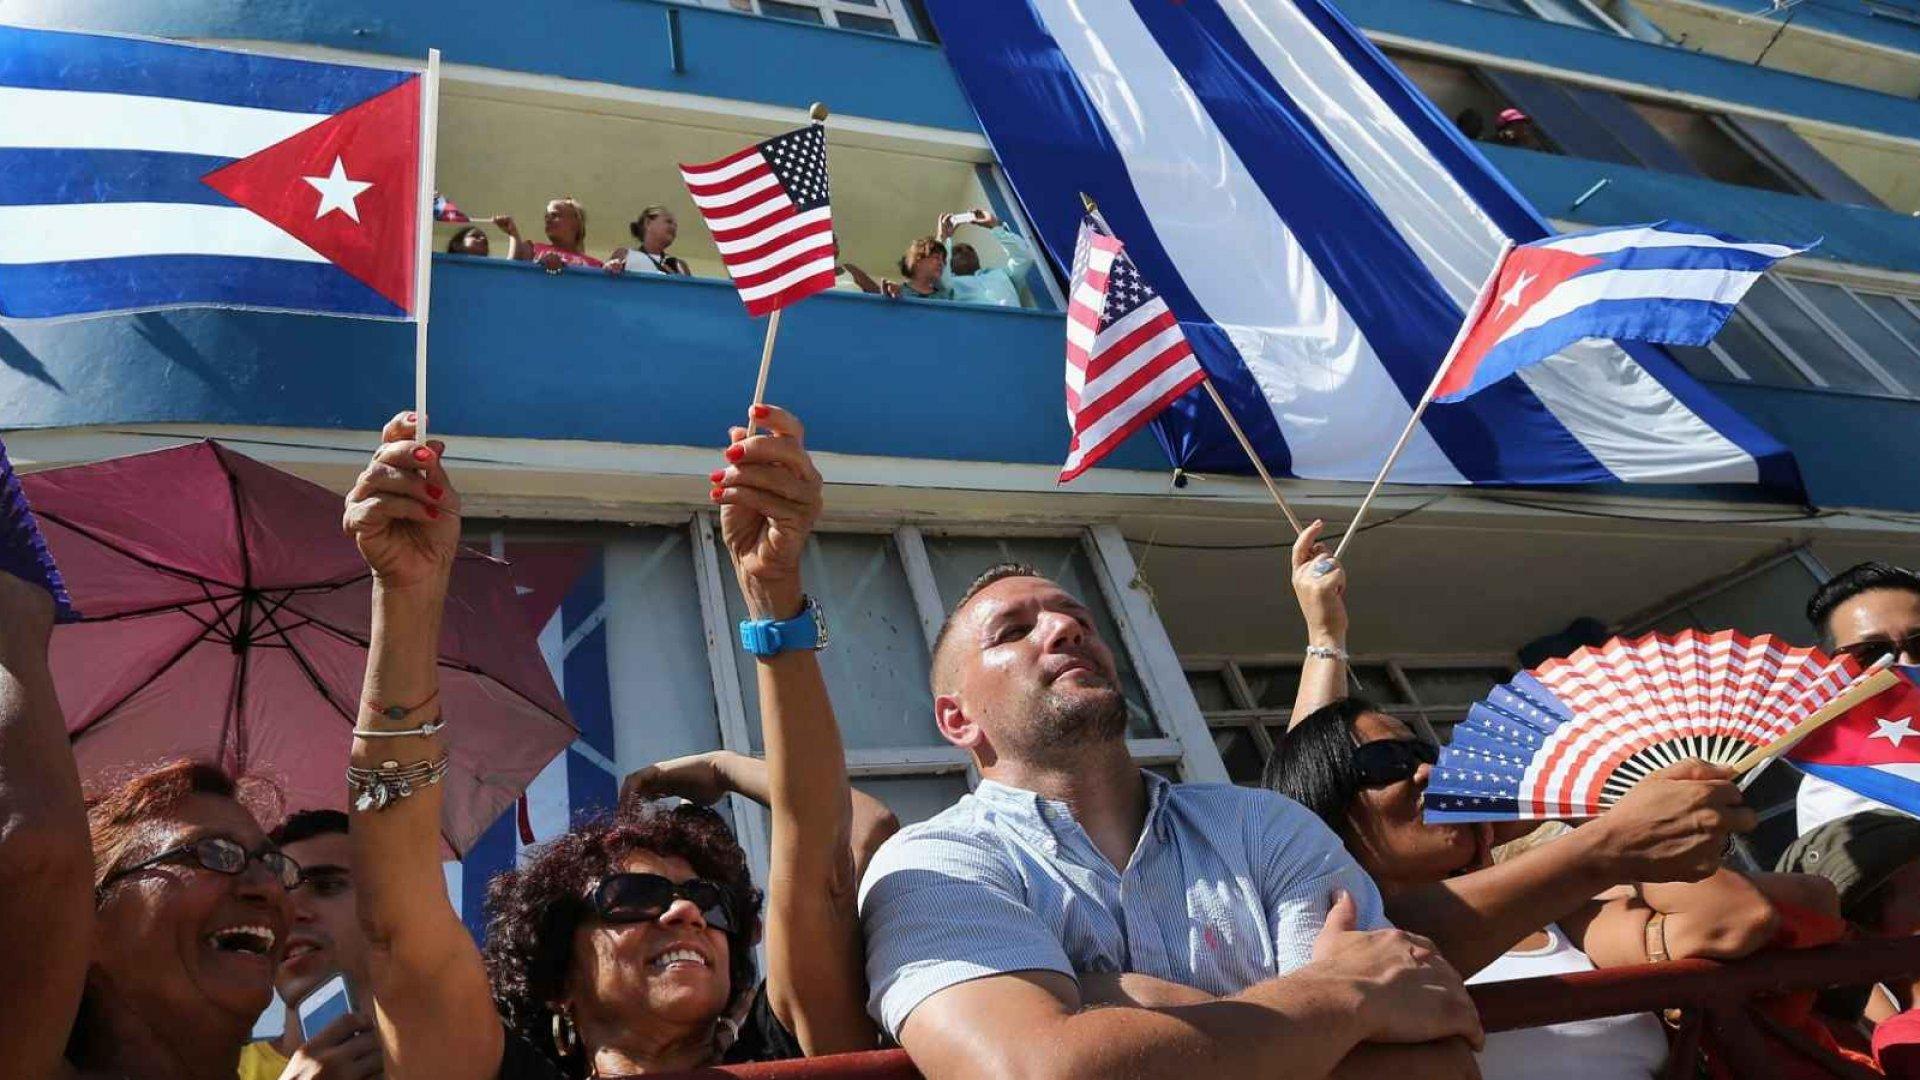 10 U.S. Companies Setting Up Shop in Cuba ASAP